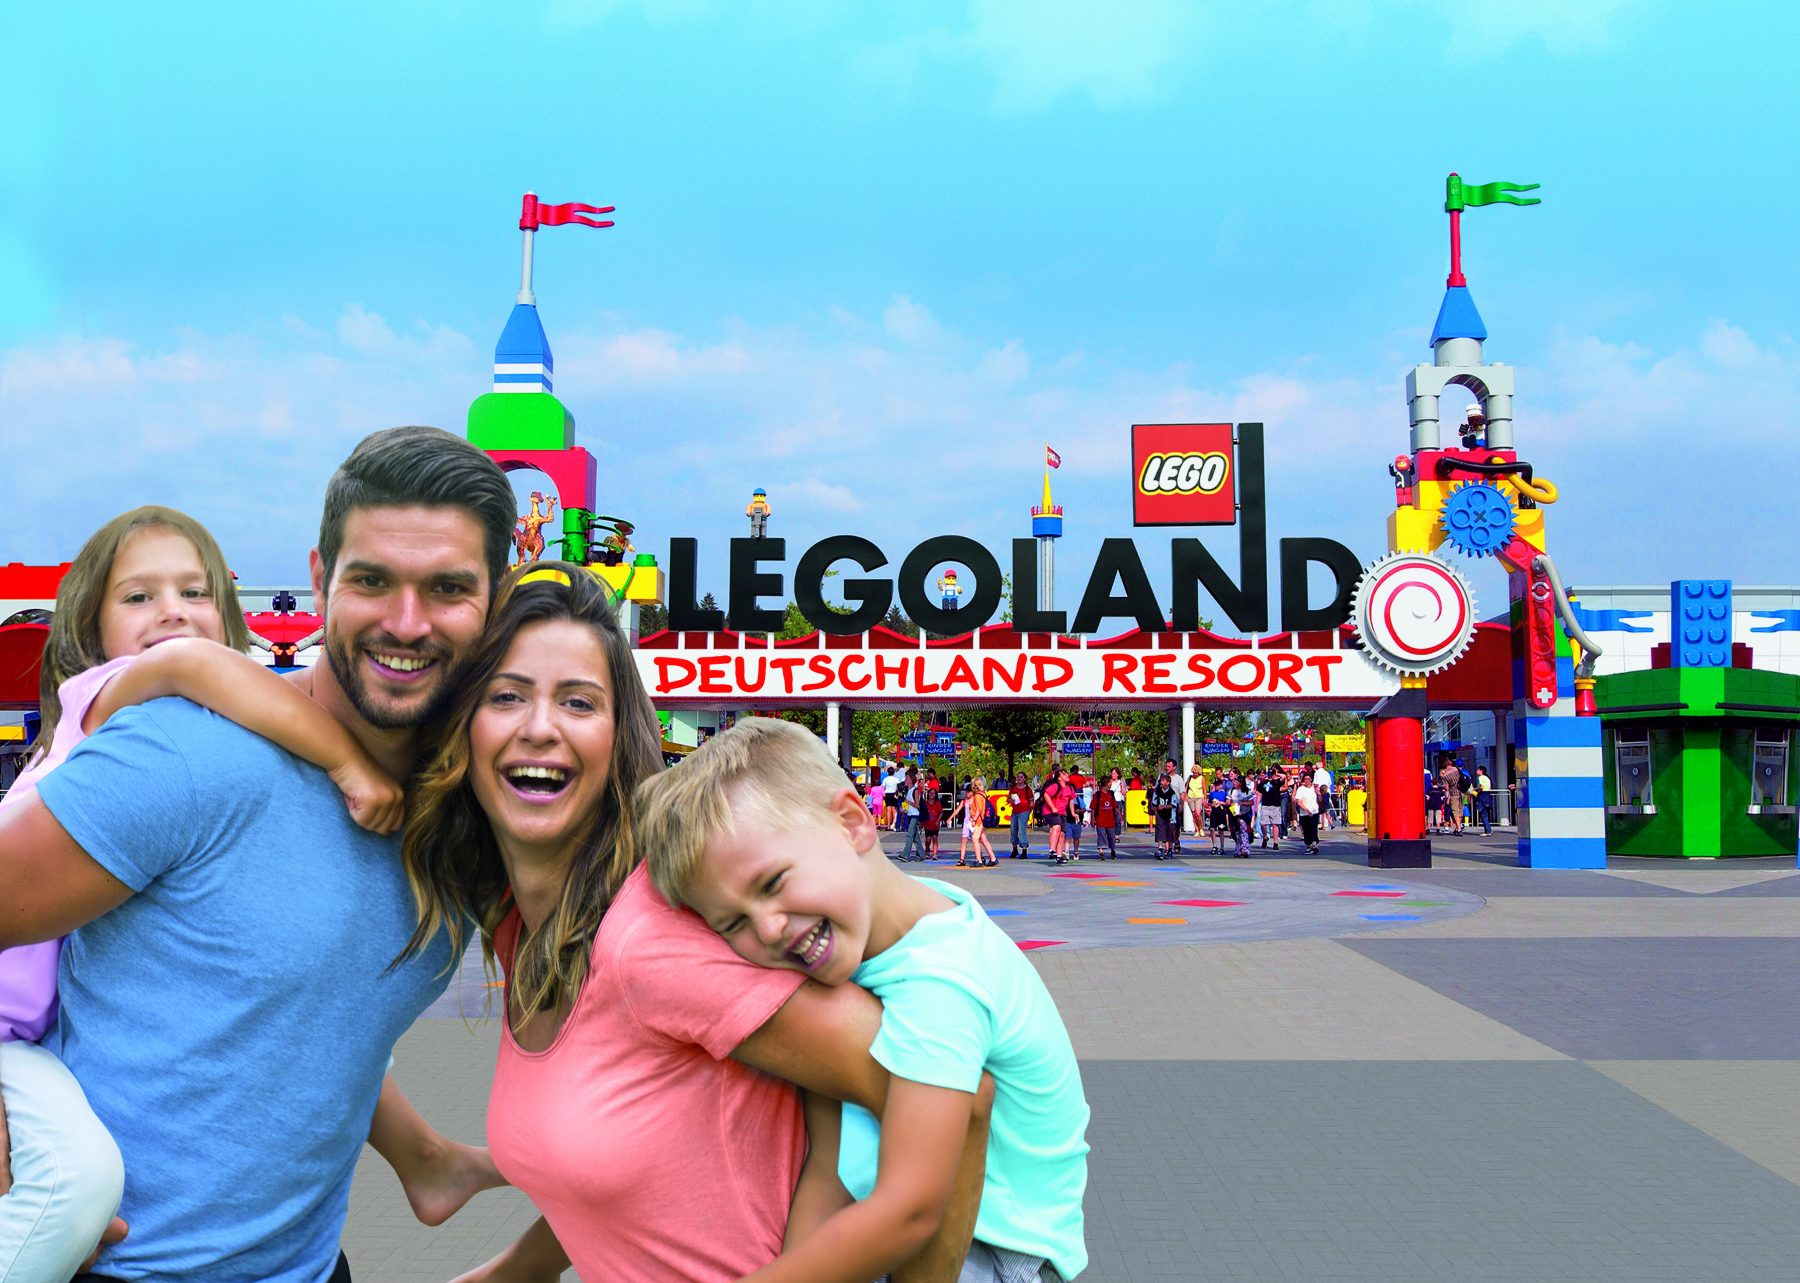 Portal(c)Legoland Deutschland Resort